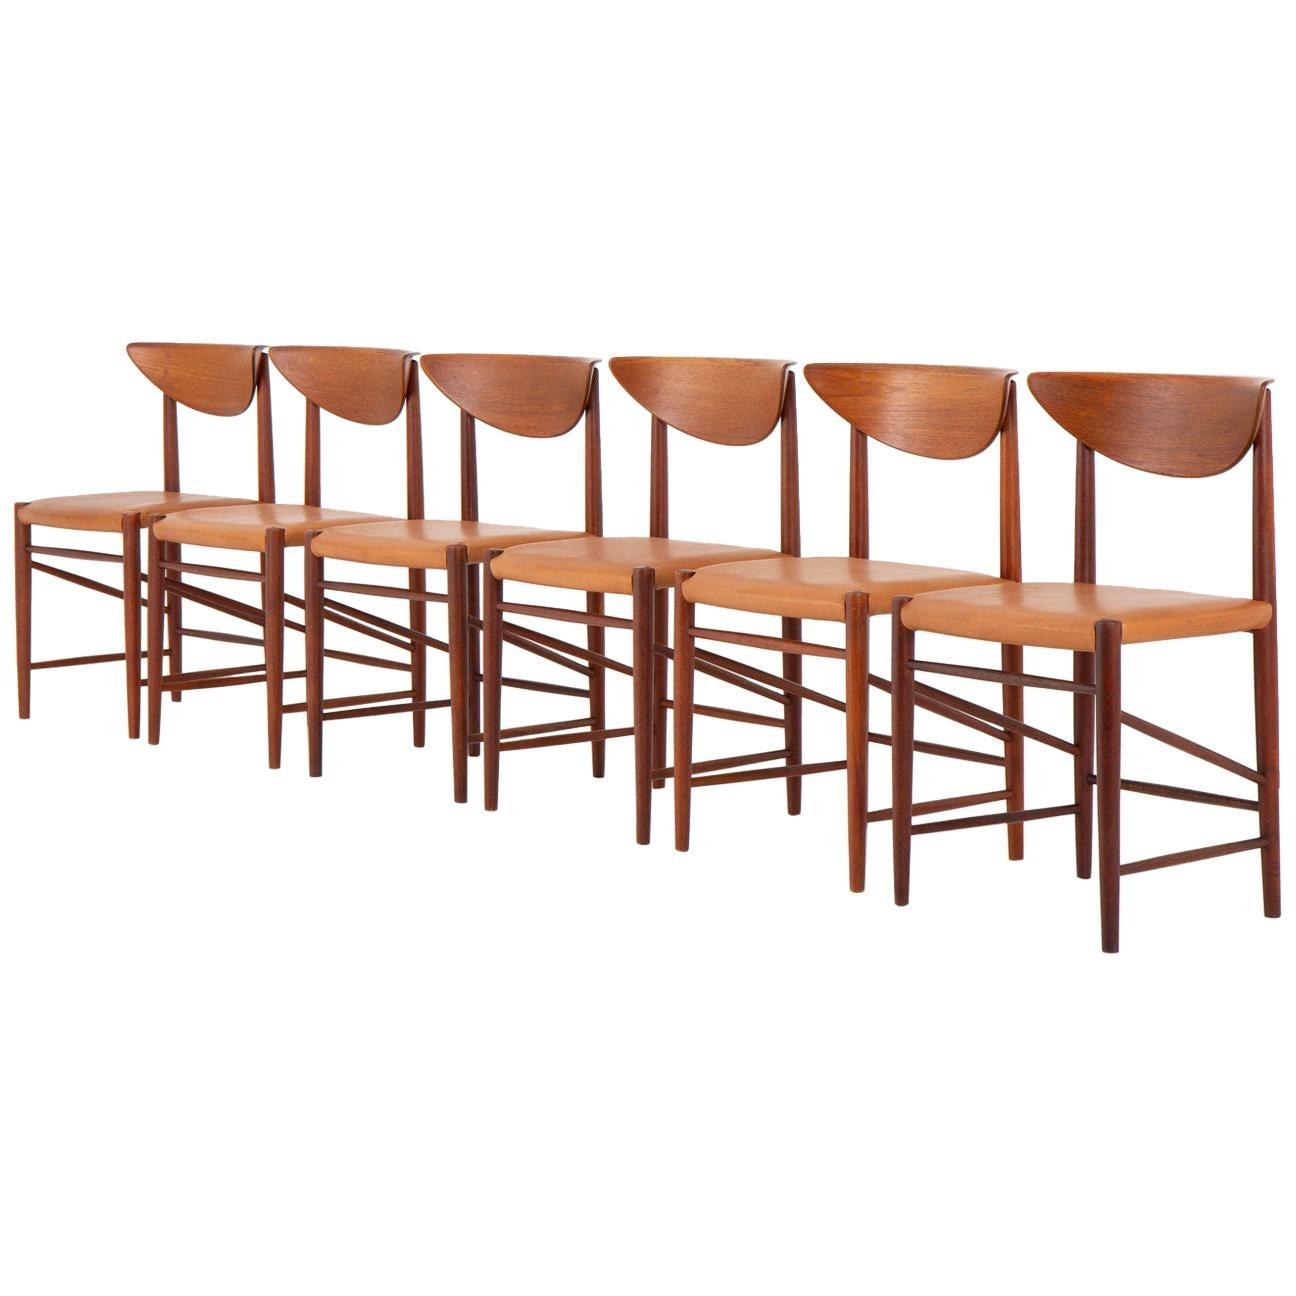 Scandinavian Dining Chairs by Peter Hvidt and Orla Mølgaard Nielsen, Model 316